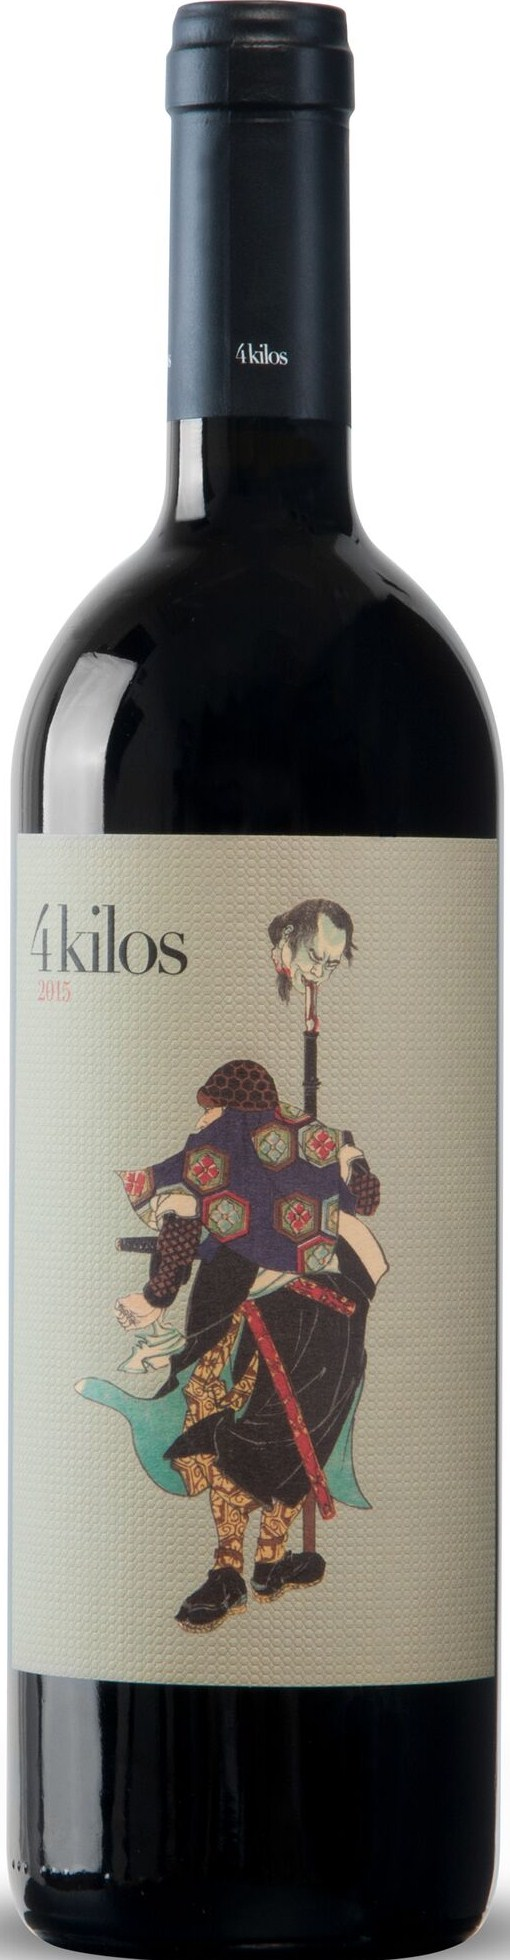 4 Kilos Negre - Mallorca D.O. Binissalem Kultwein Grimalt 2015